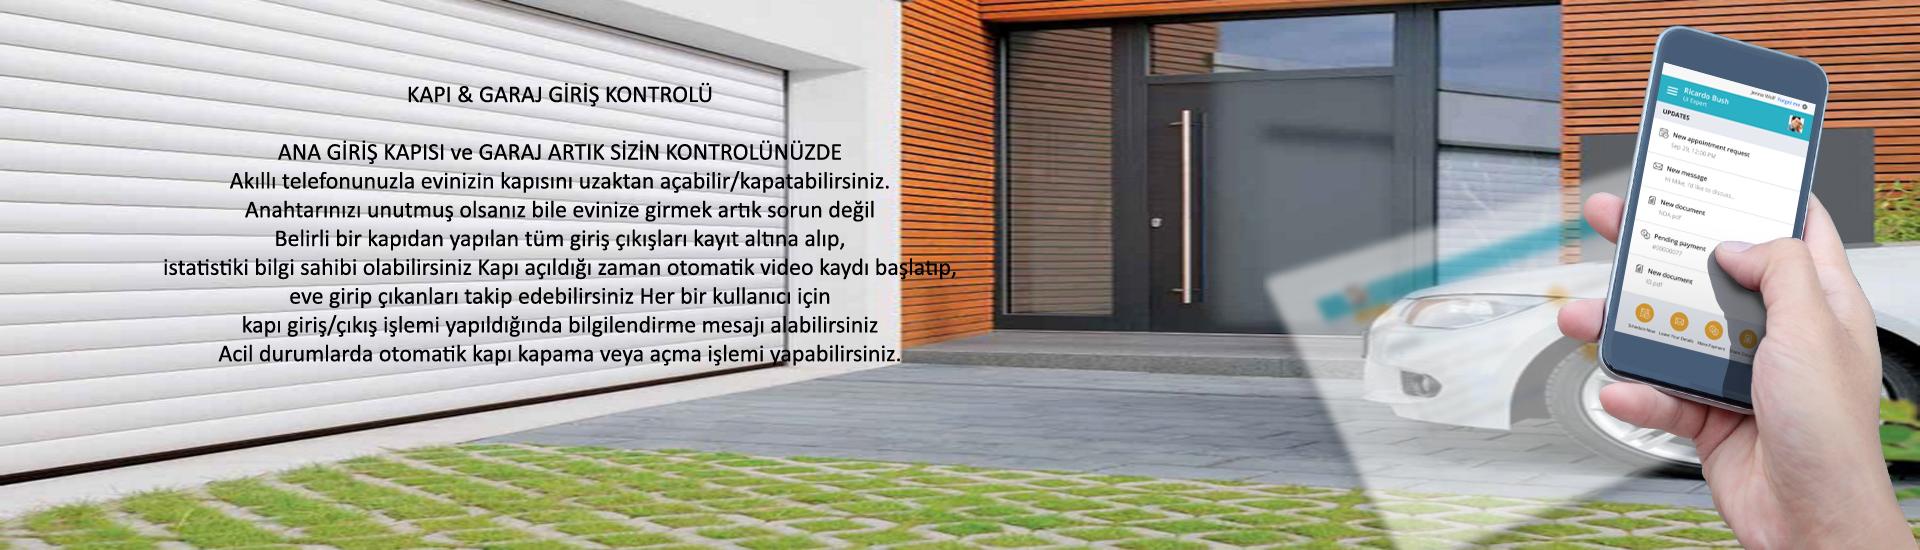 KAPI & GARAJ GİRİŞ KONTROLÜ